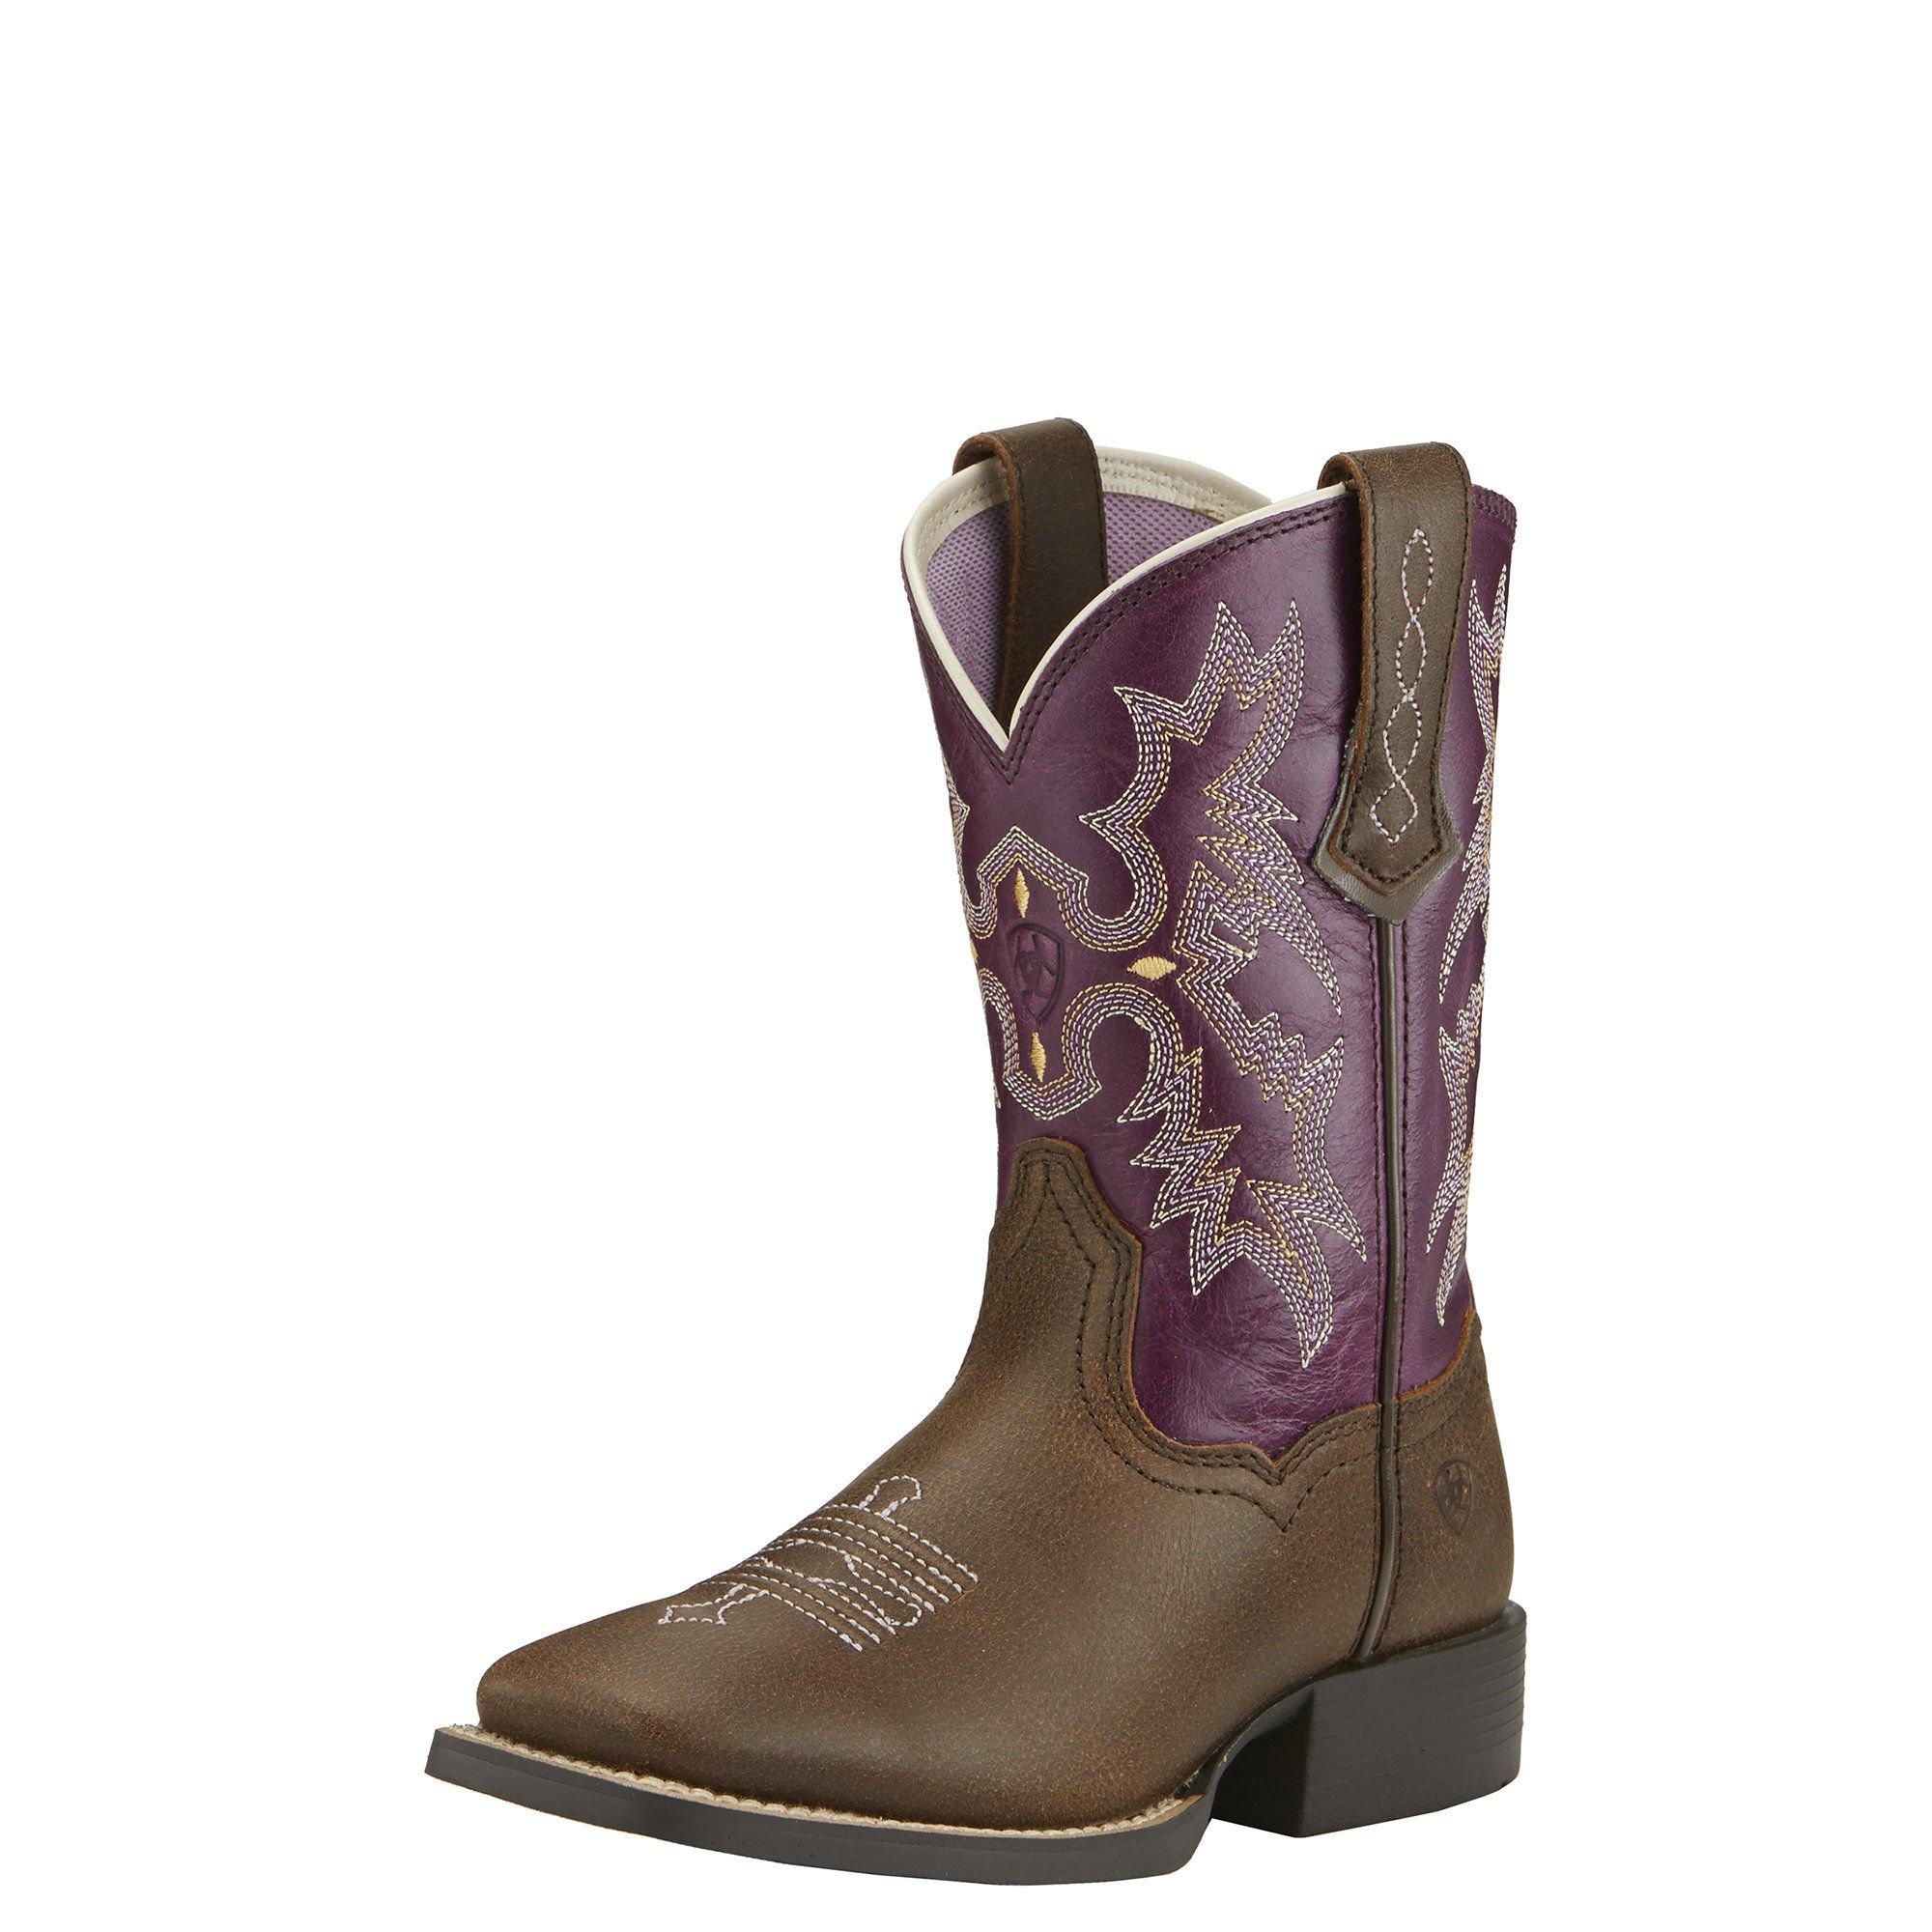 Ariat Kids' Tombstone Western Cowboy Boot, Vintage Bomber/Plum, 12 M US Little Kid